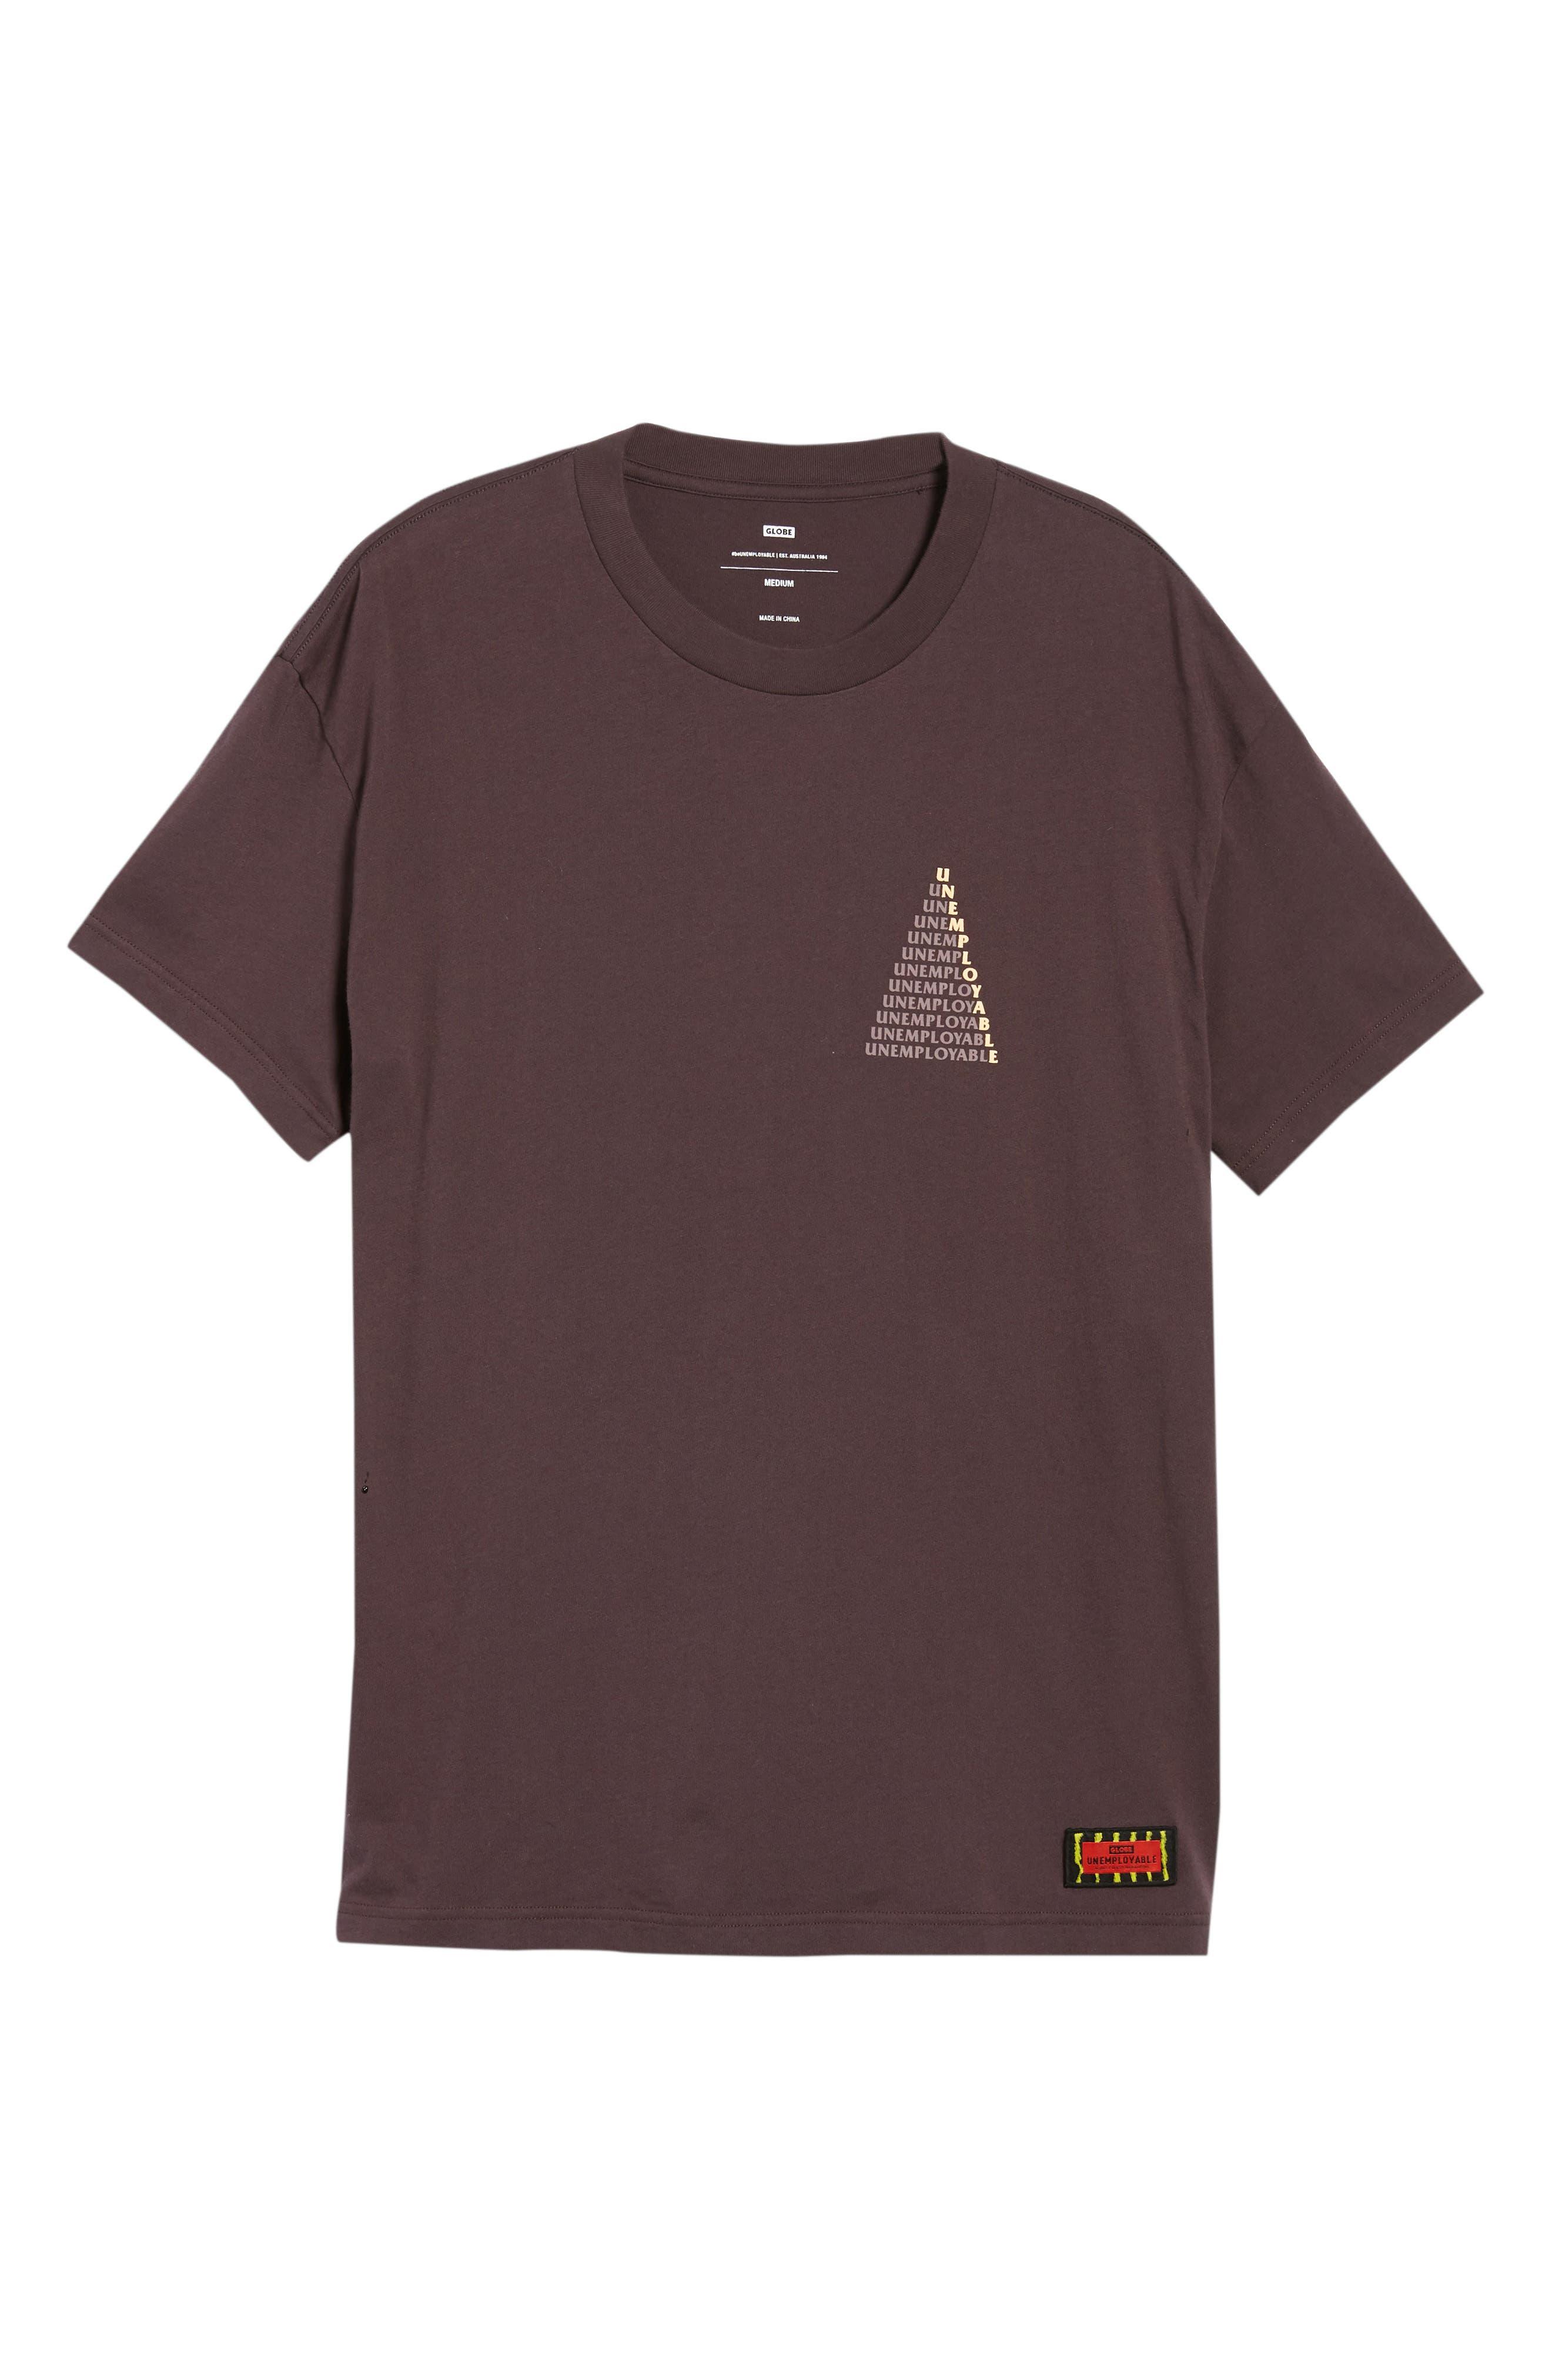 UE Pyramid T-Shirt,                             Alternate thumbnail 6, color,                             WINE